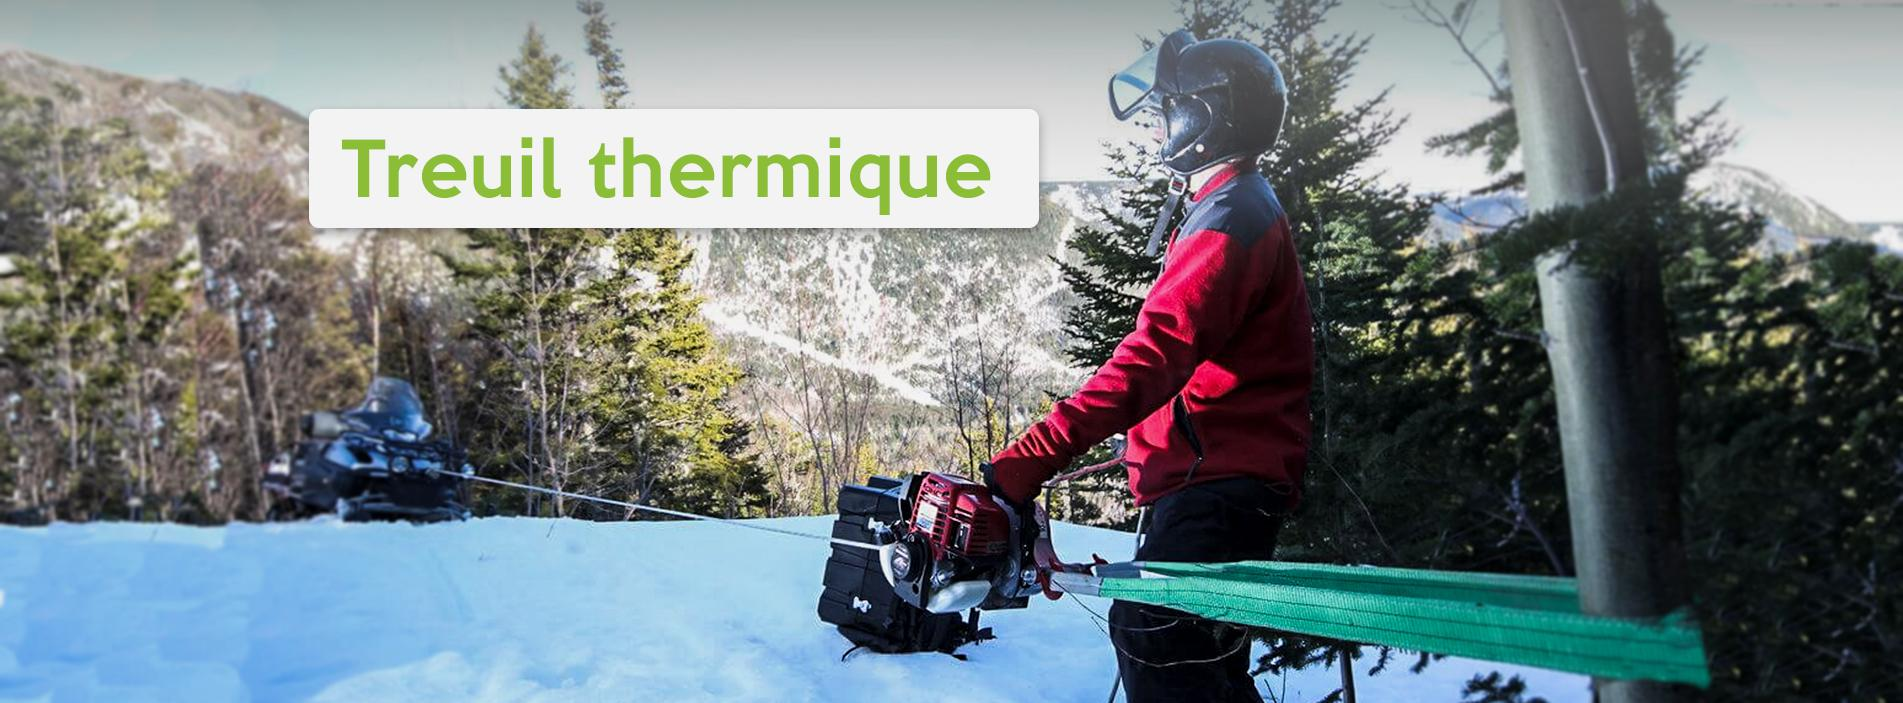 Treuil thermique